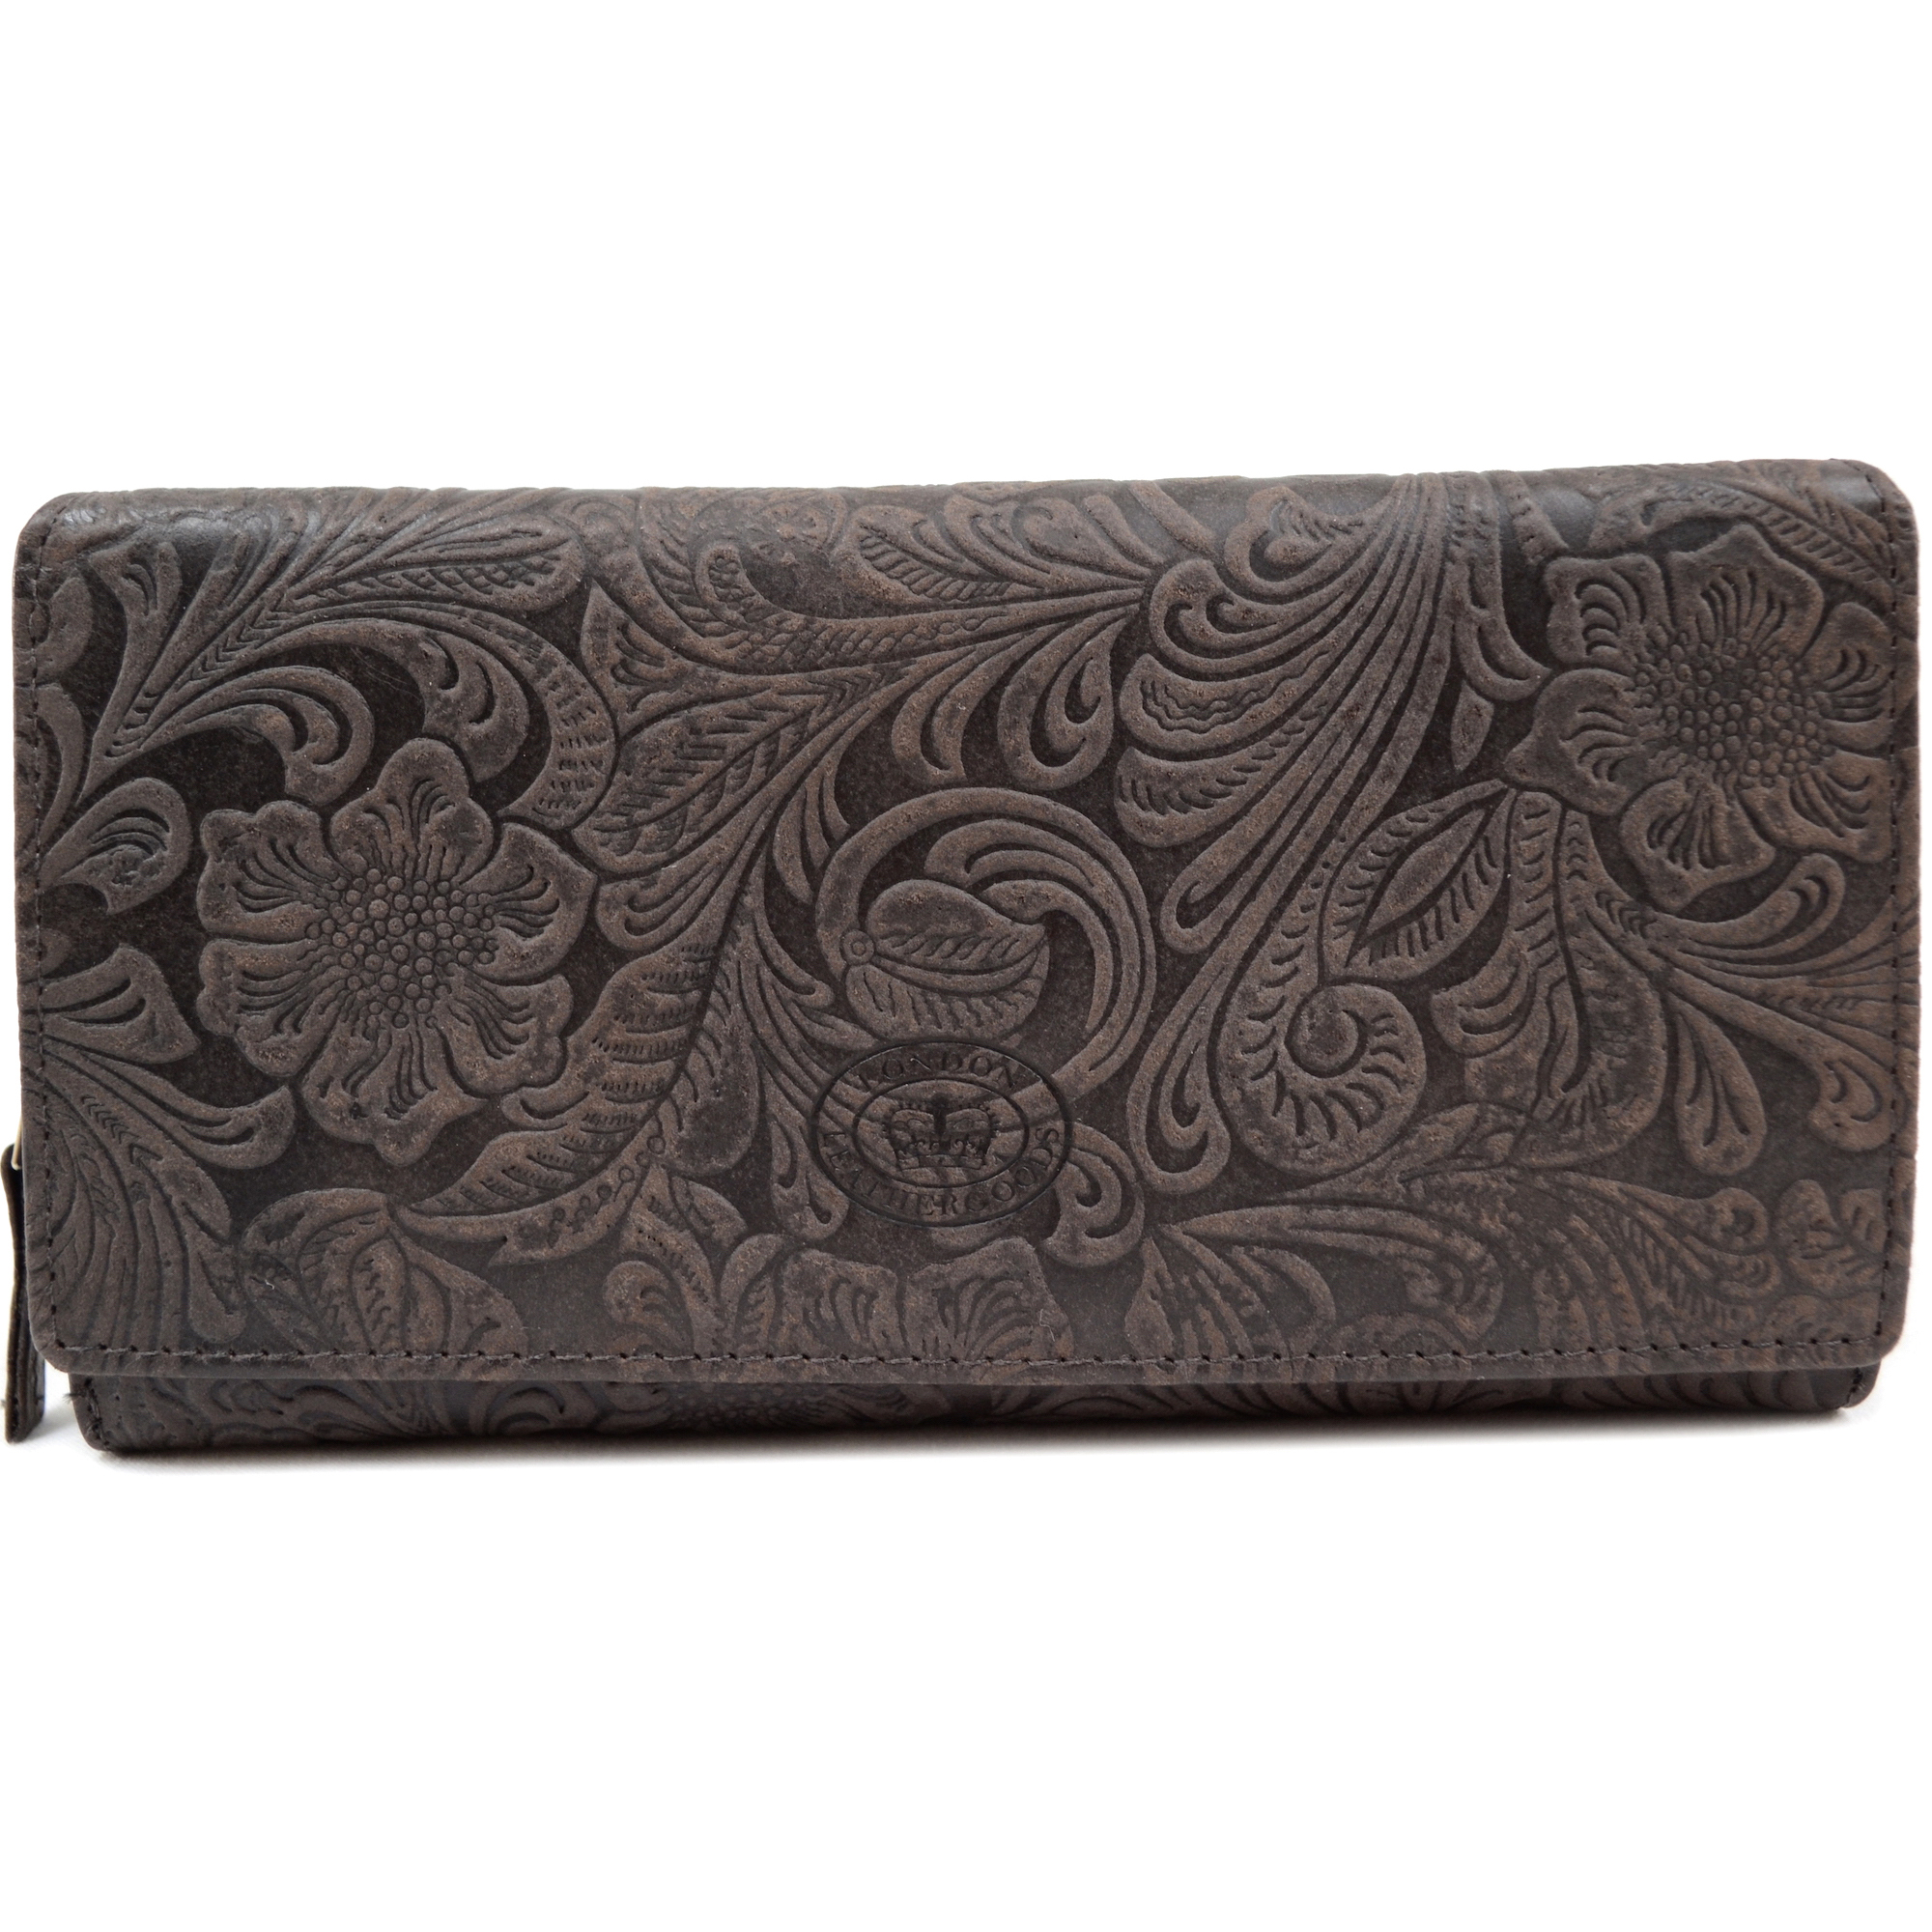 Large Genuine Leather Vintage Floral Purse / Clutch